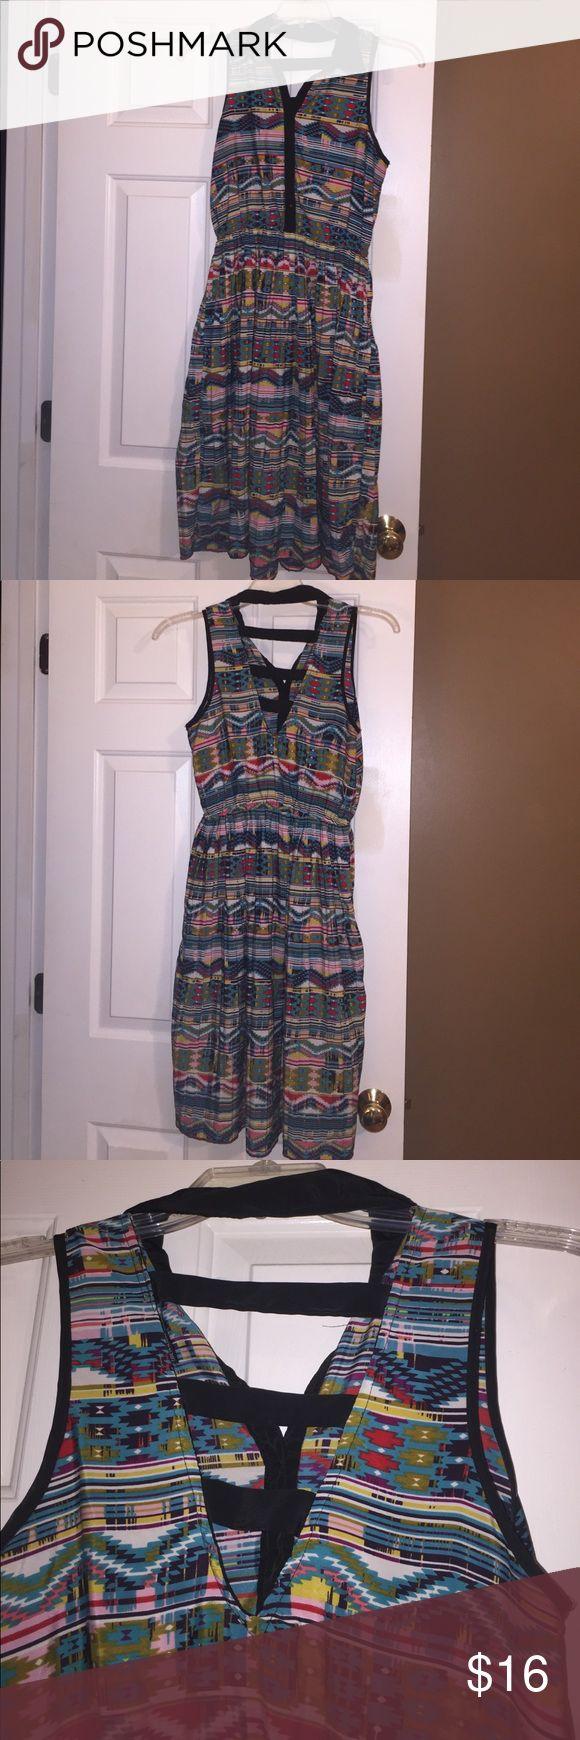 "Aztec Printed Short Sleeve Dress Aztec printed dress. Short sleeve with a collar. Dress length hanging up is 39"". Dresses Midi"